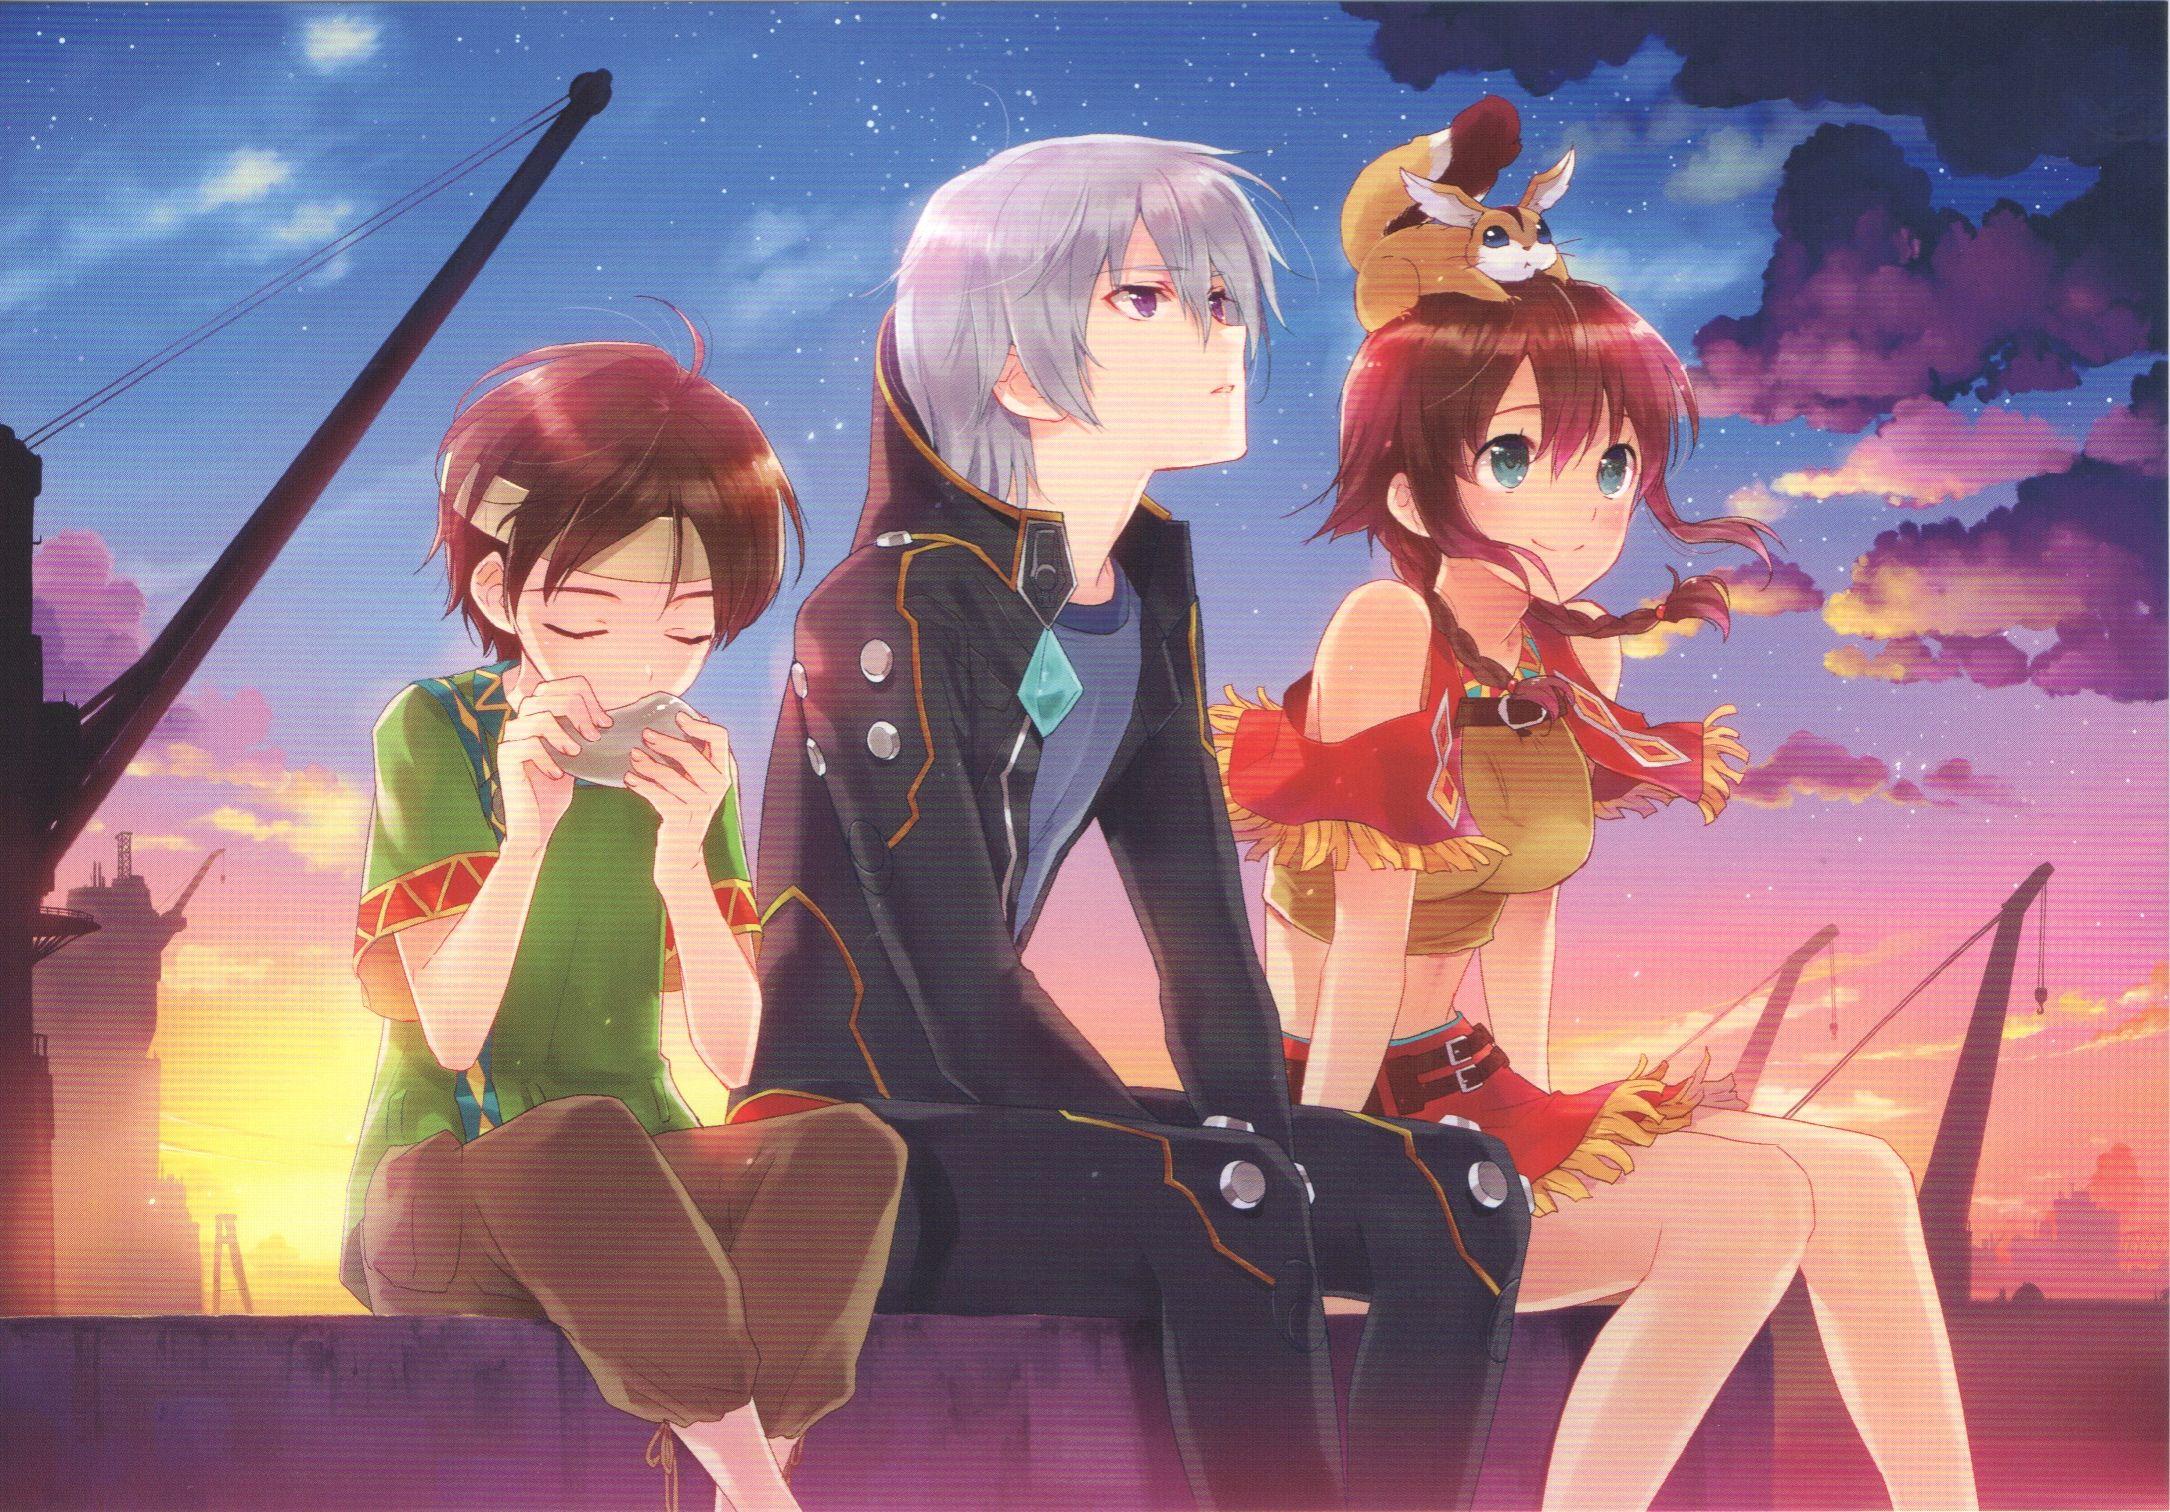 Tags Scan Kasukabe Akira End Cards Suisei No Gargantia Amy Suisei No Gargantia Ledo Suisei No Gargant Animation Artwork Anime Friendship Awesome Anime